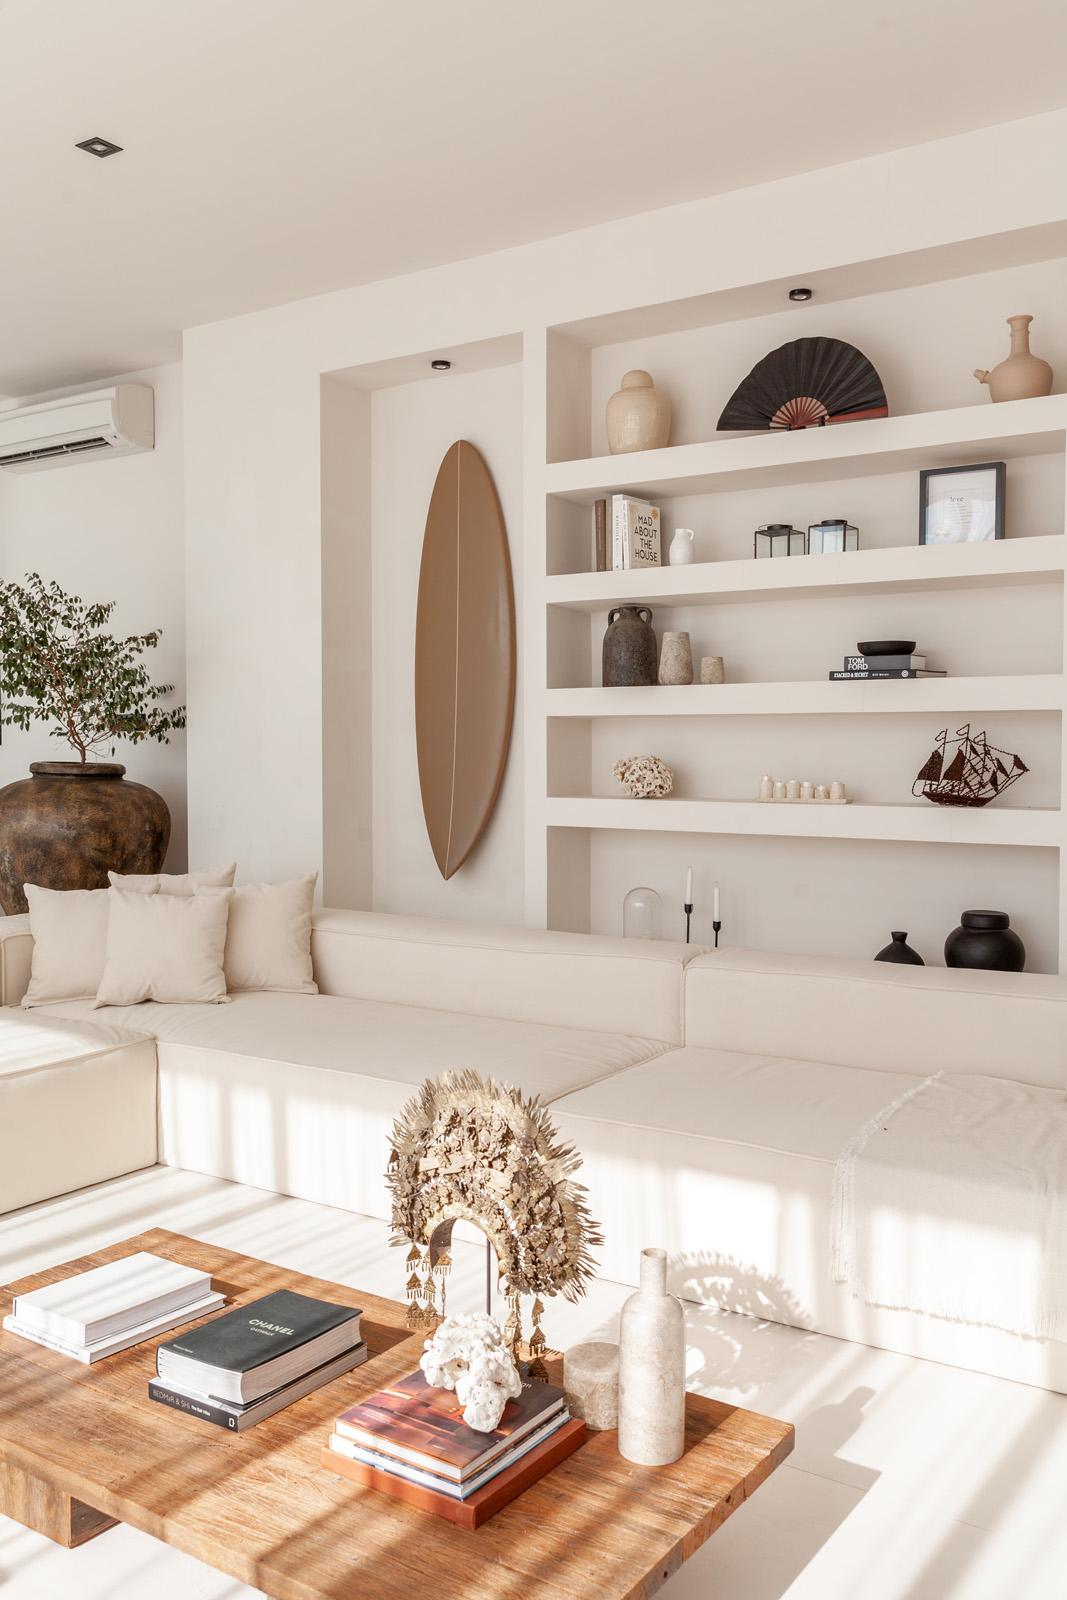 Bali Interiors. white home, decor, living room, decor